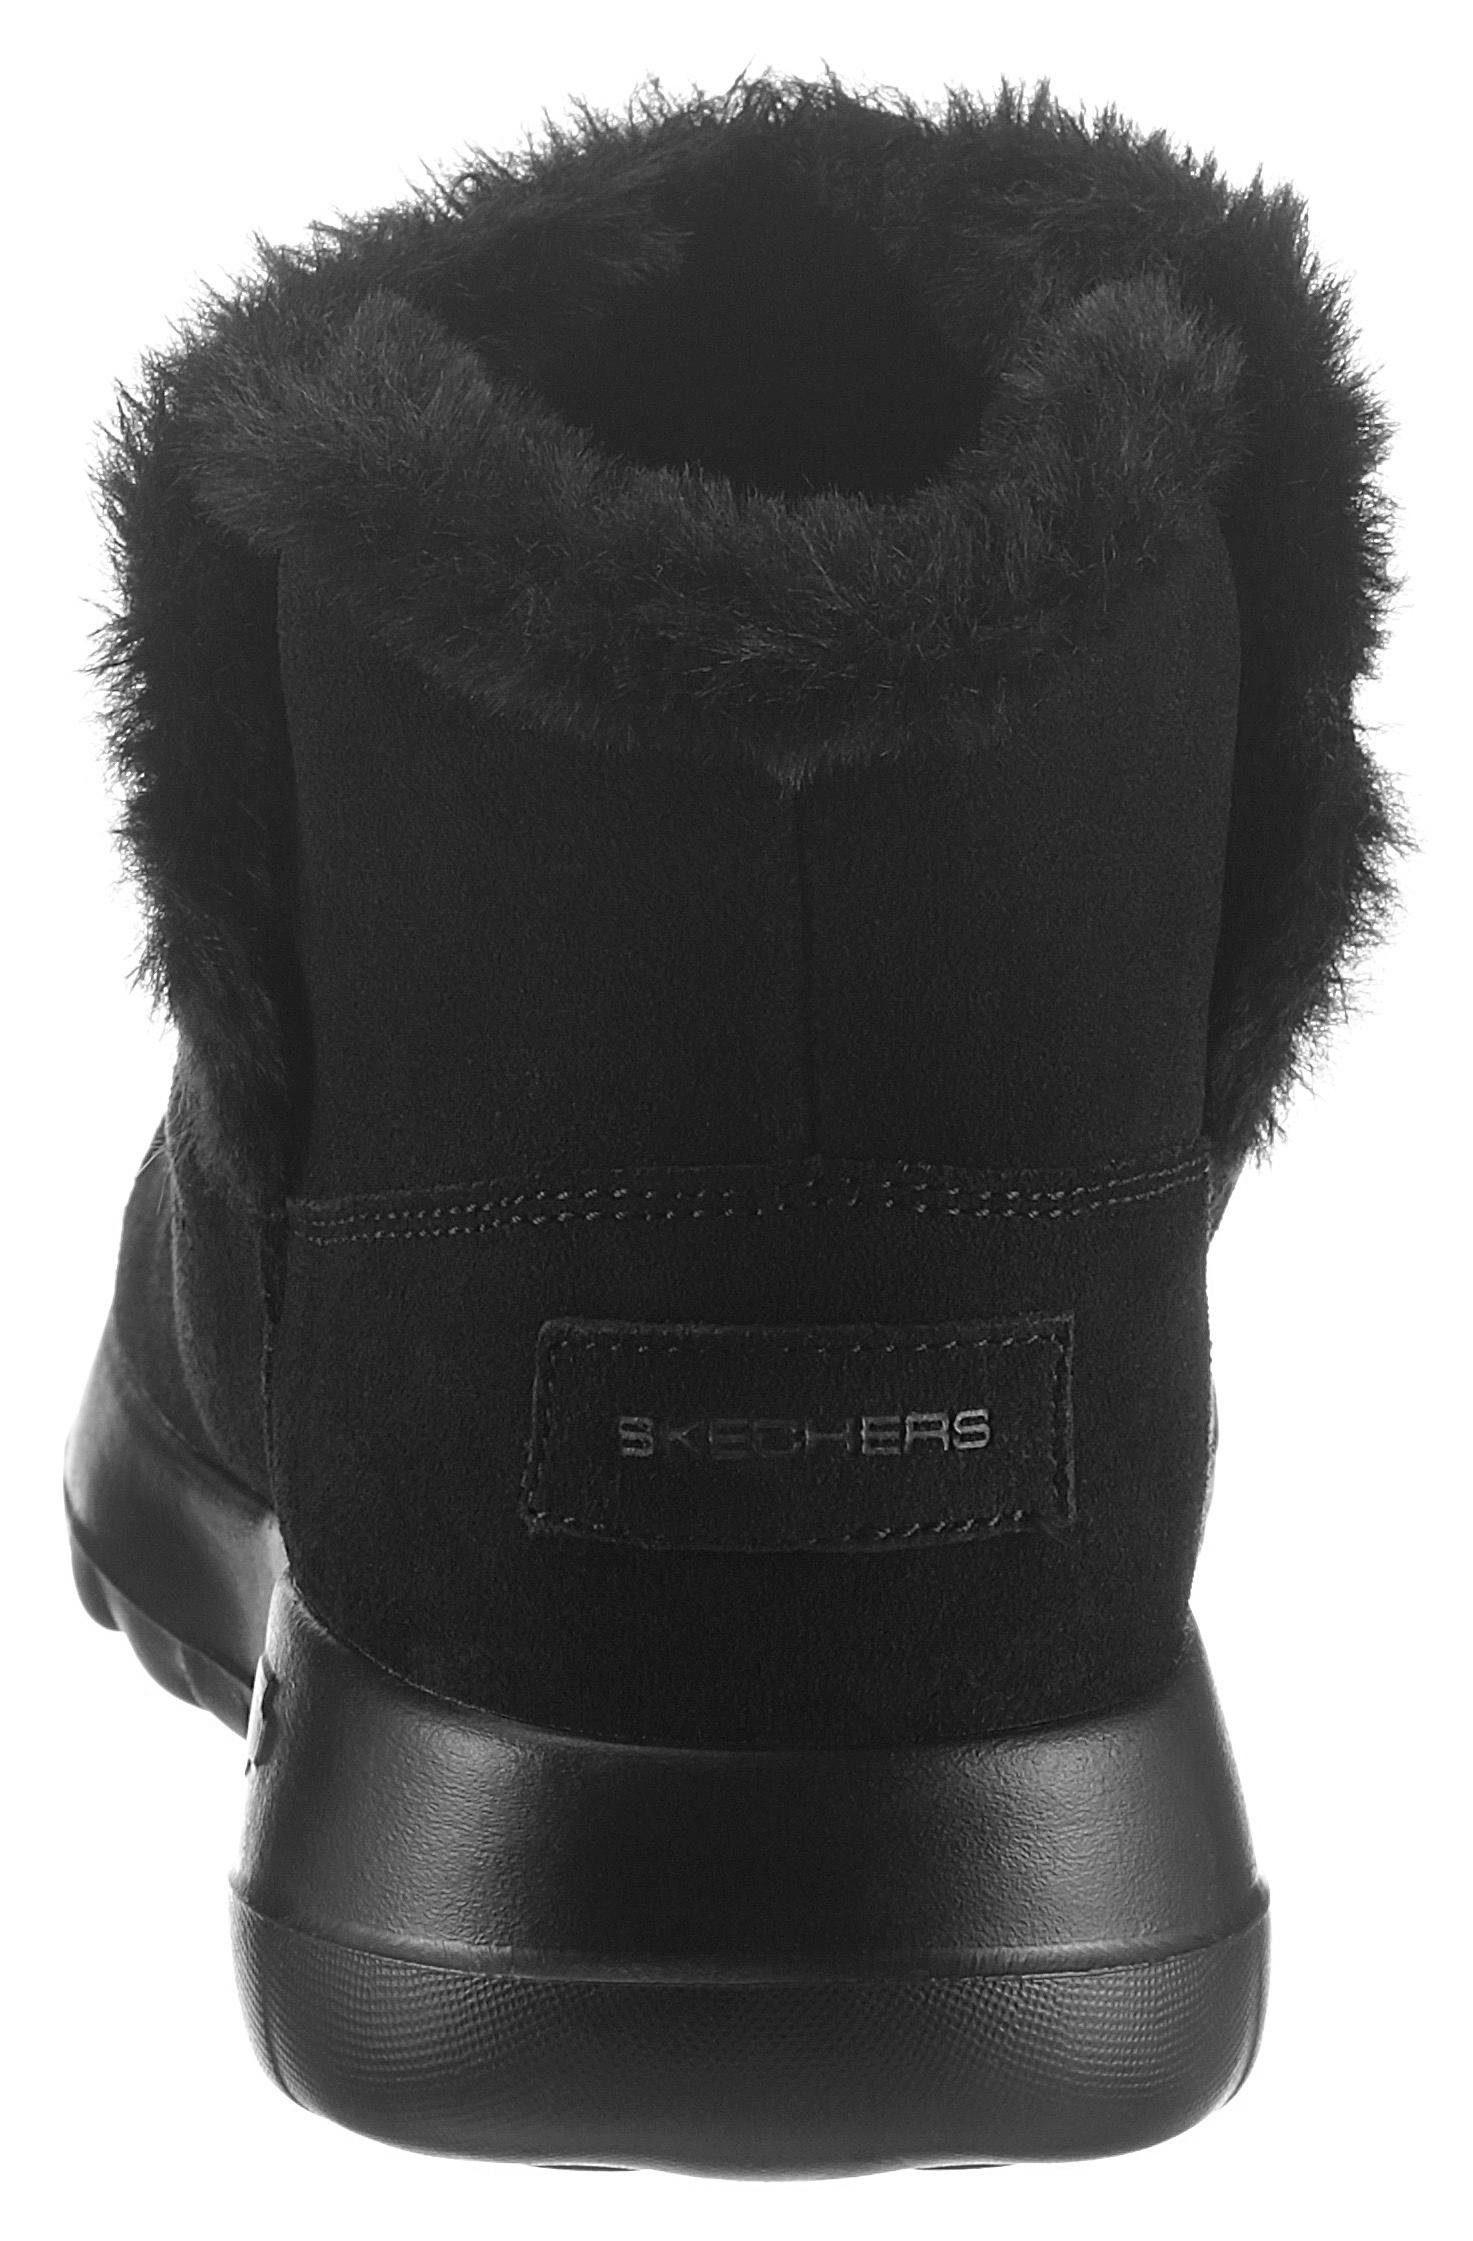 Skechers Bundle Up Ladies Boots